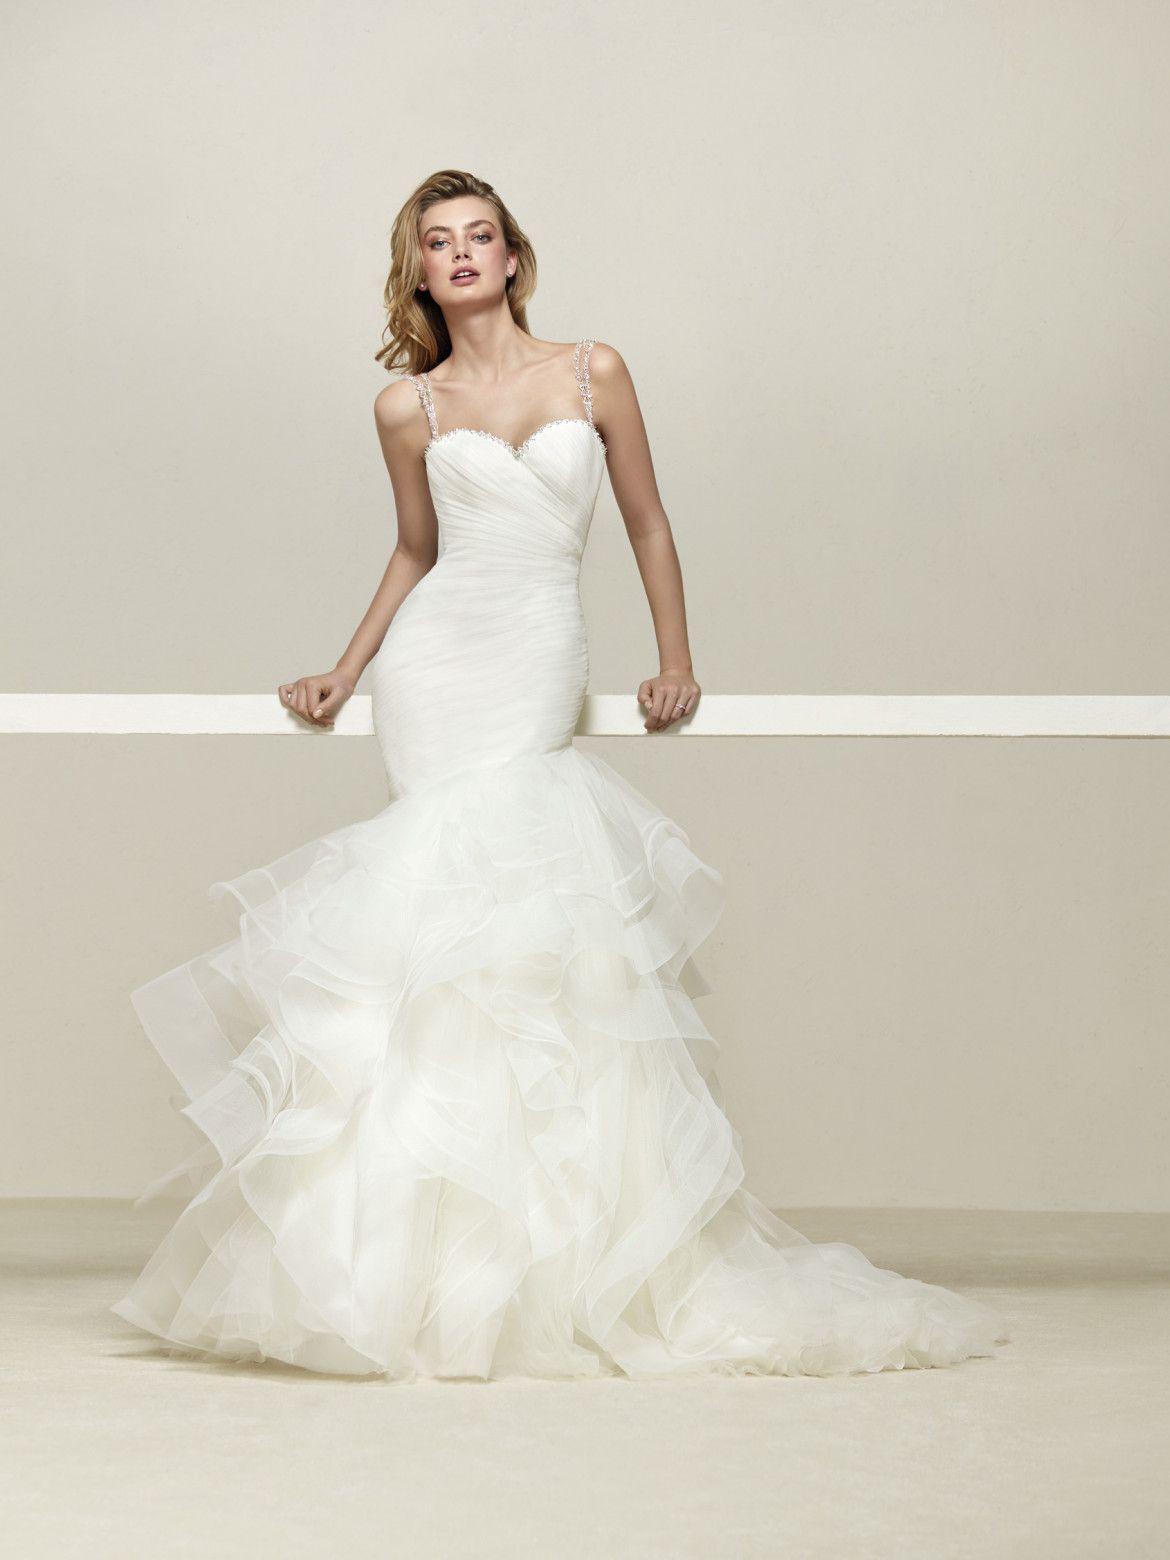 Pronoviasdrema pronovias bridal gowns pinterest pronovias